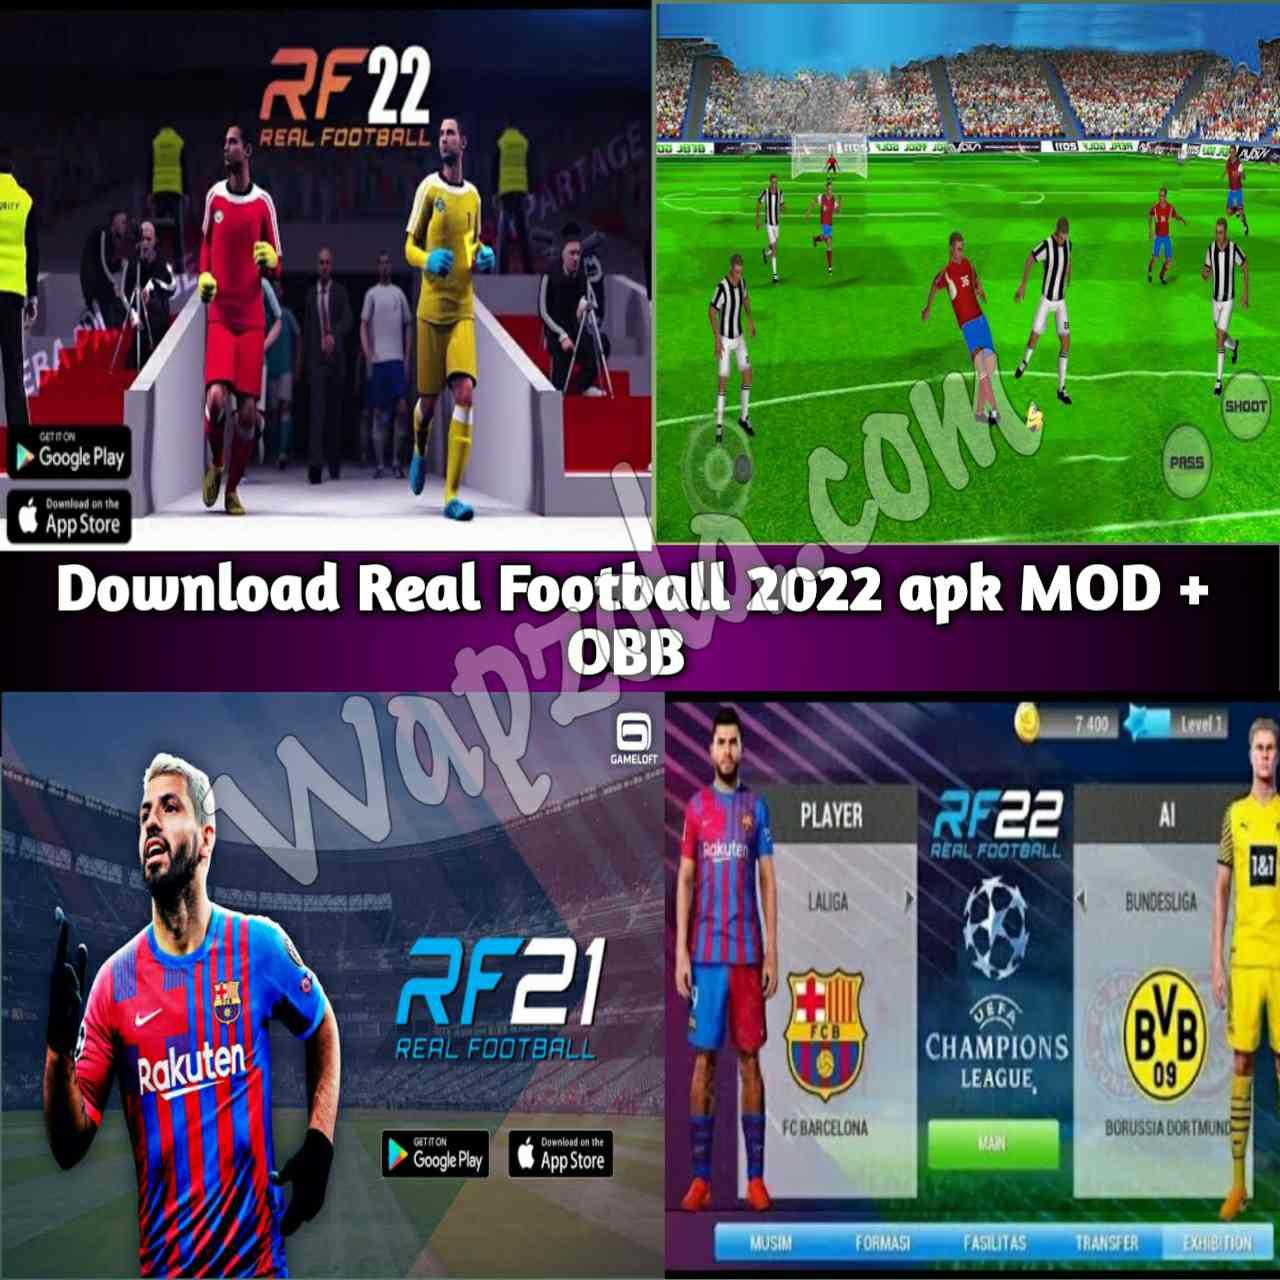 download-real-football-2022-mod-apk-obb-data